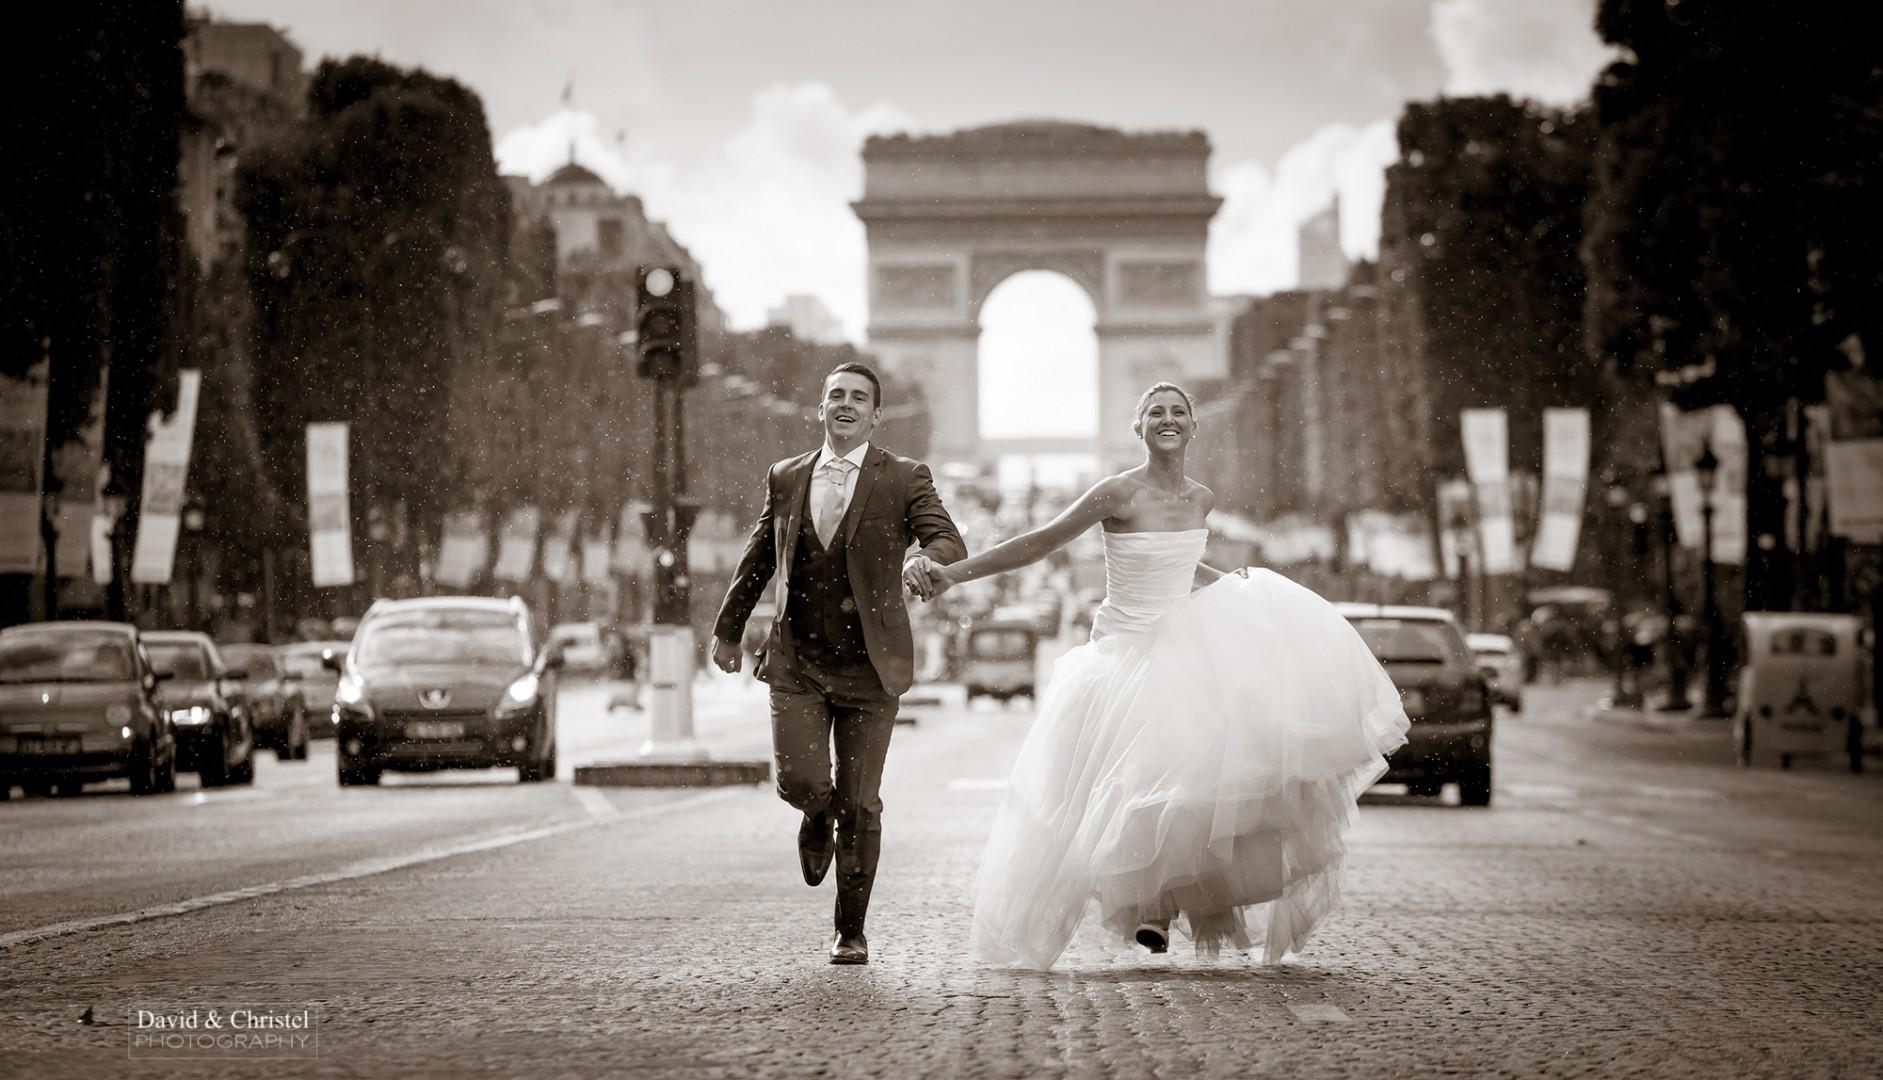 Photographe de mariage en France